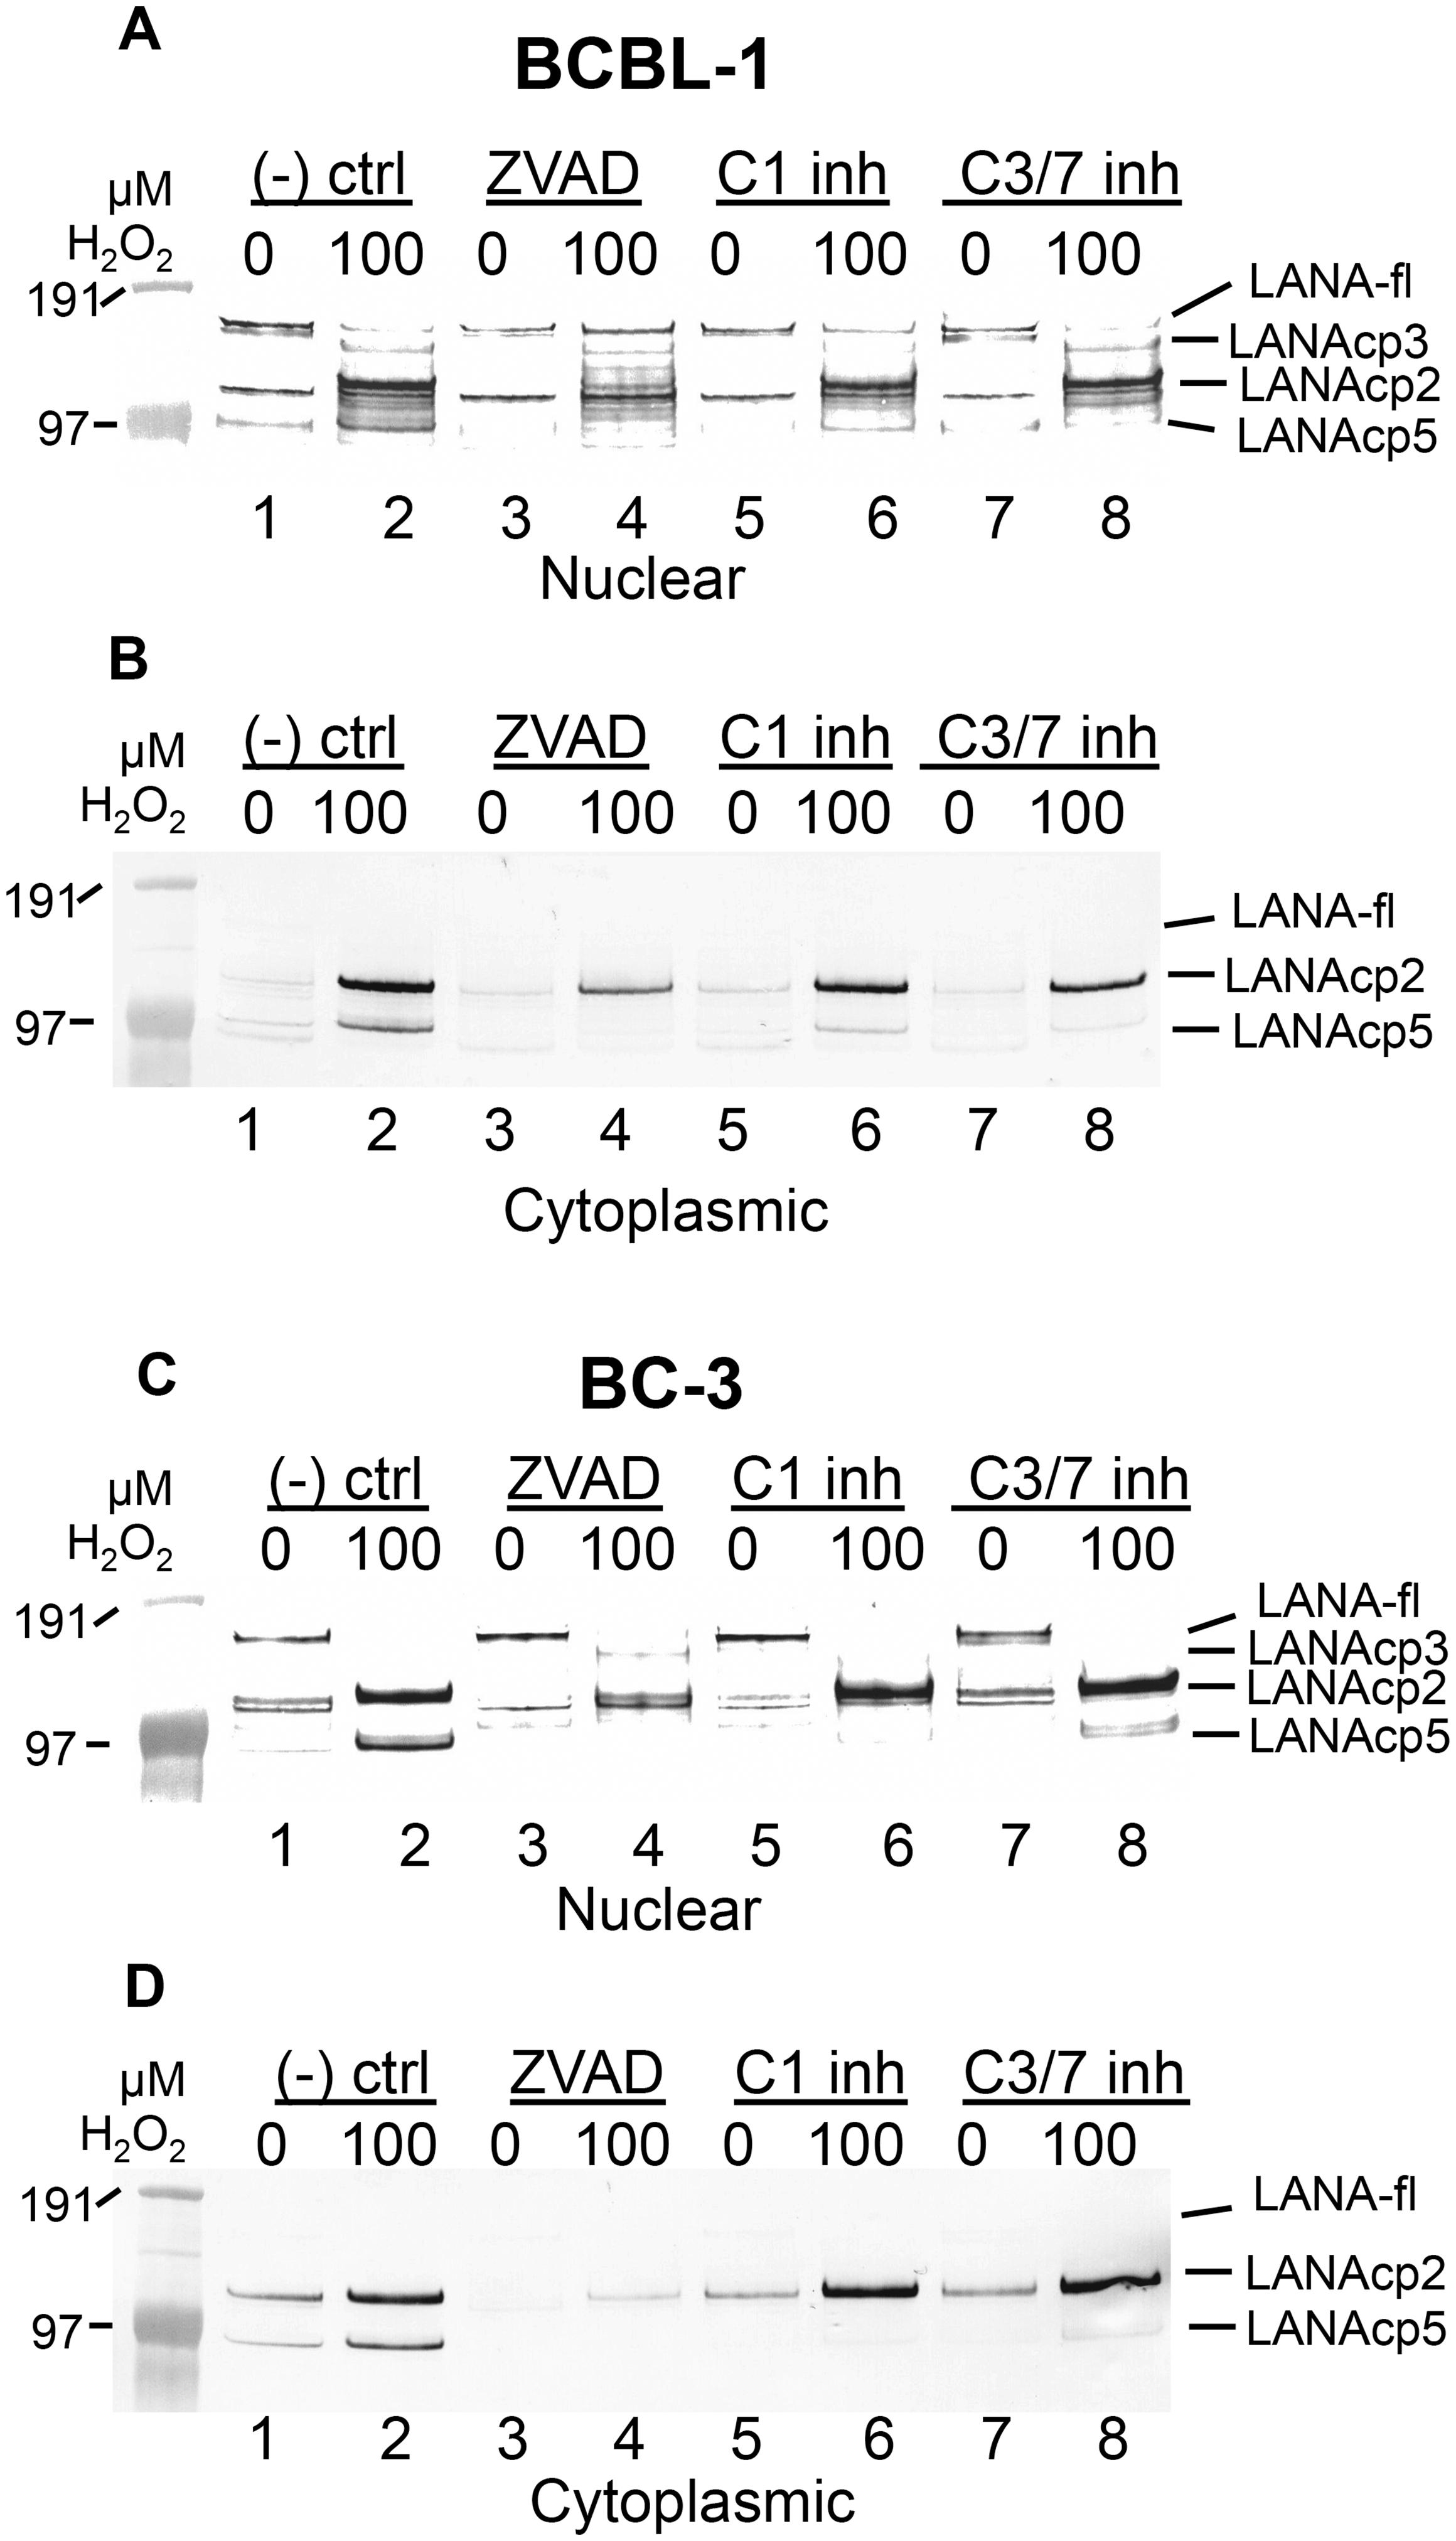 Caspase inhibitors block oxidative stress-induced changes in LANA.